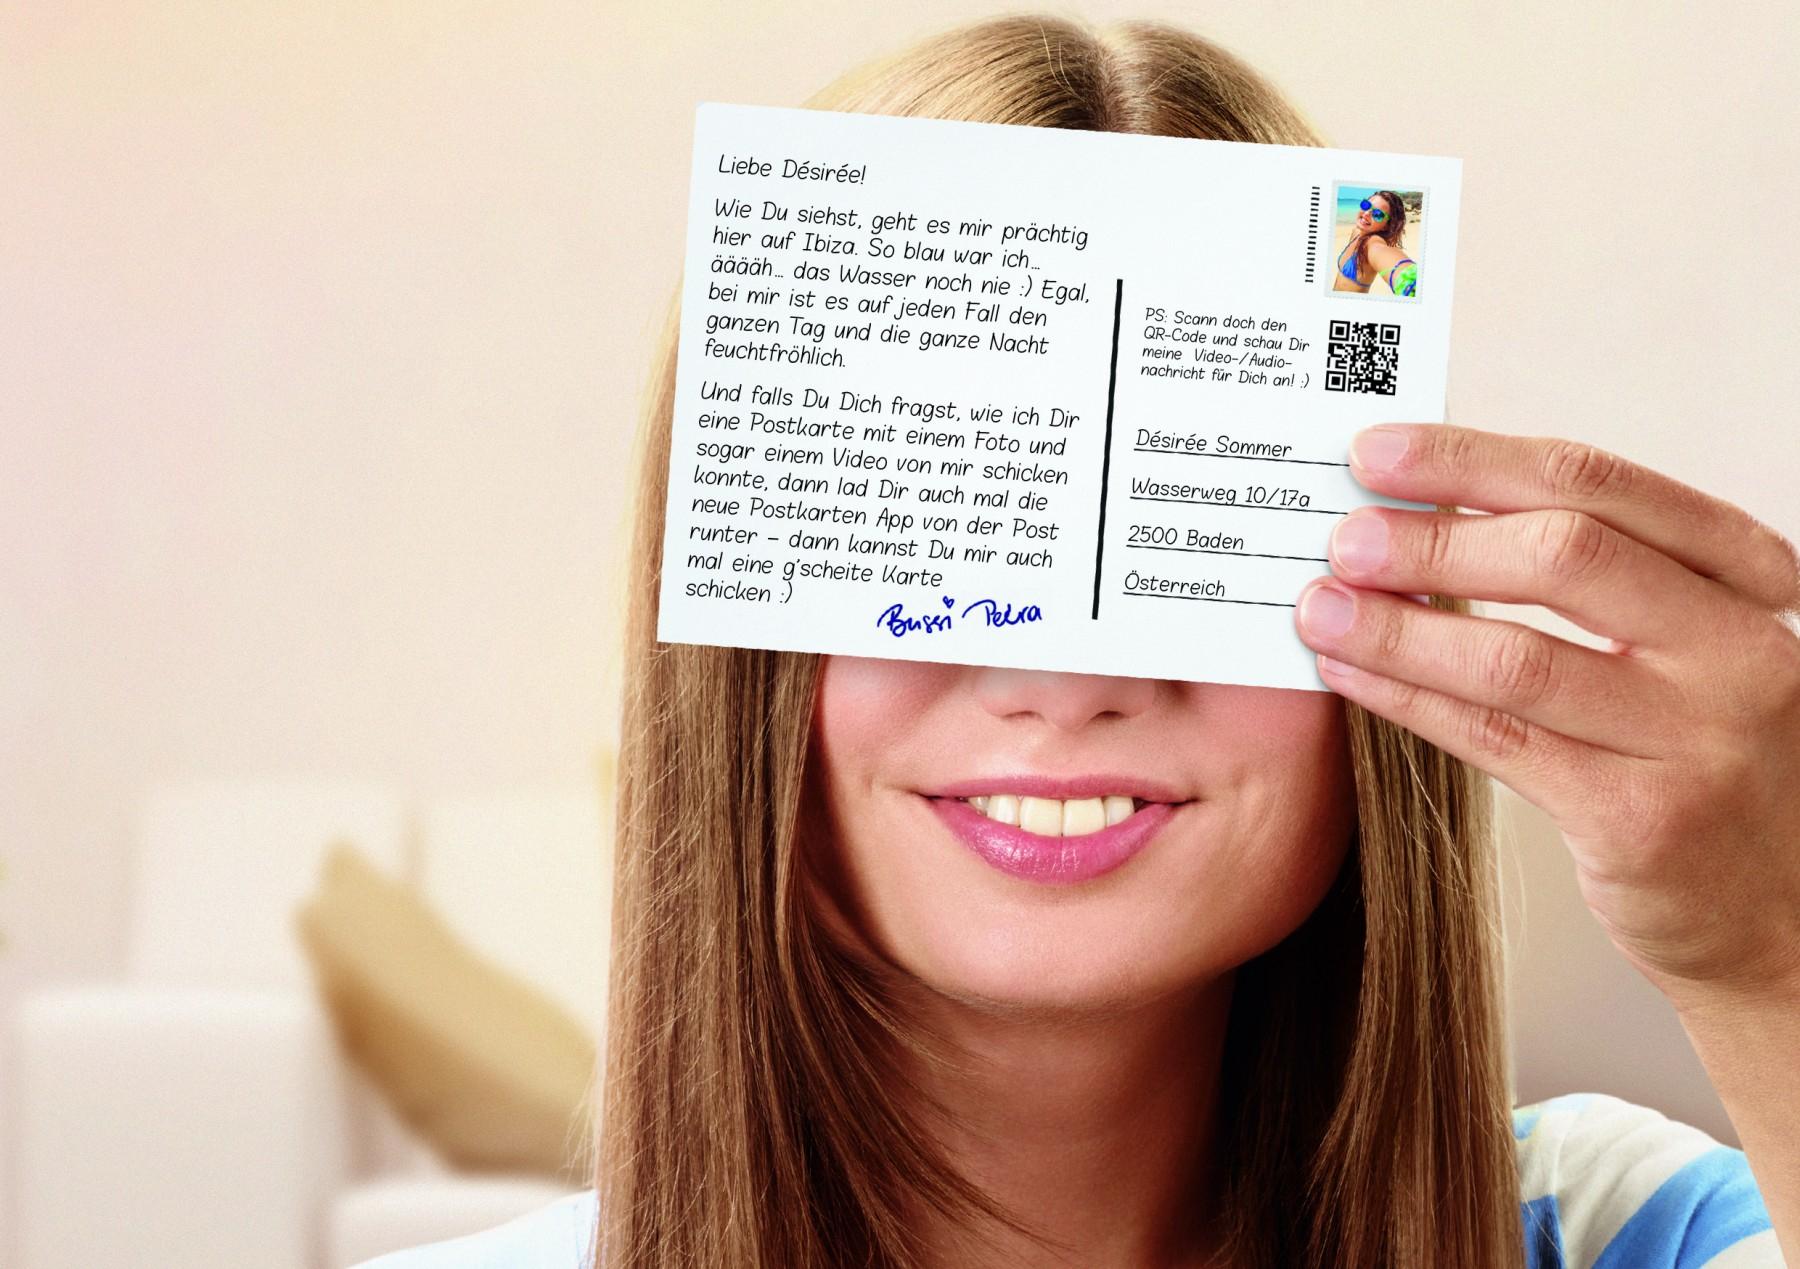 probiermal.at - Individuelle Postkarte 1x GRATIS versenden